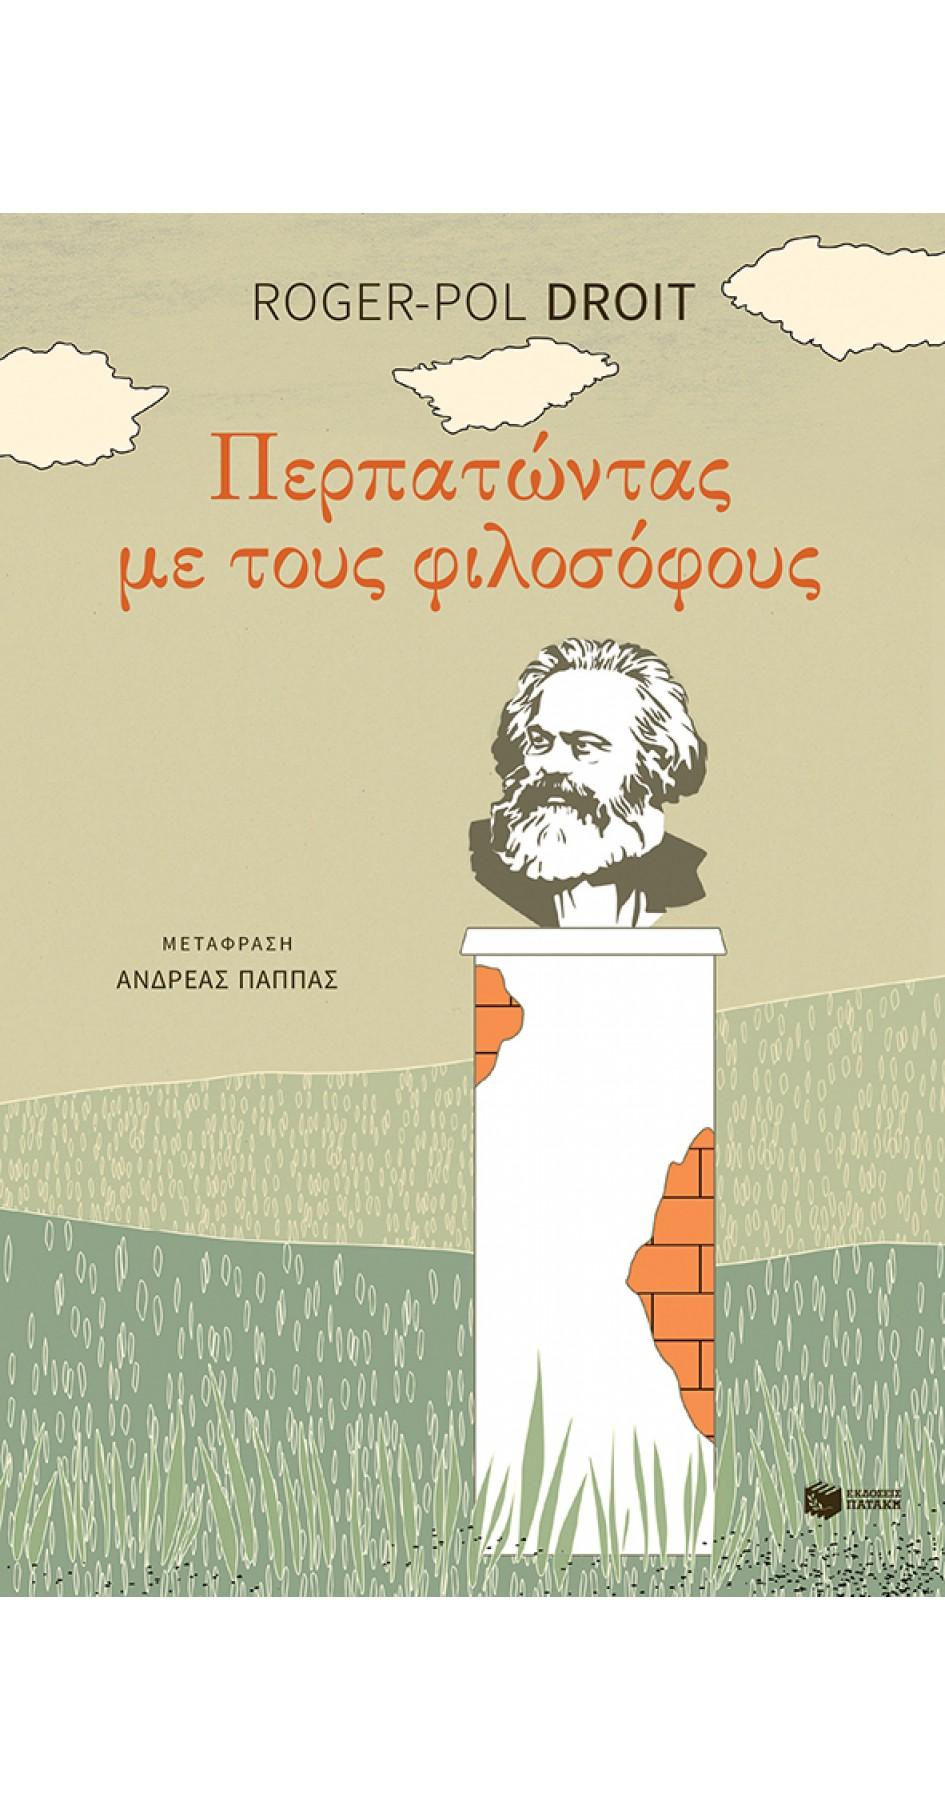 Comment marchent les philosophes (book in Greek)